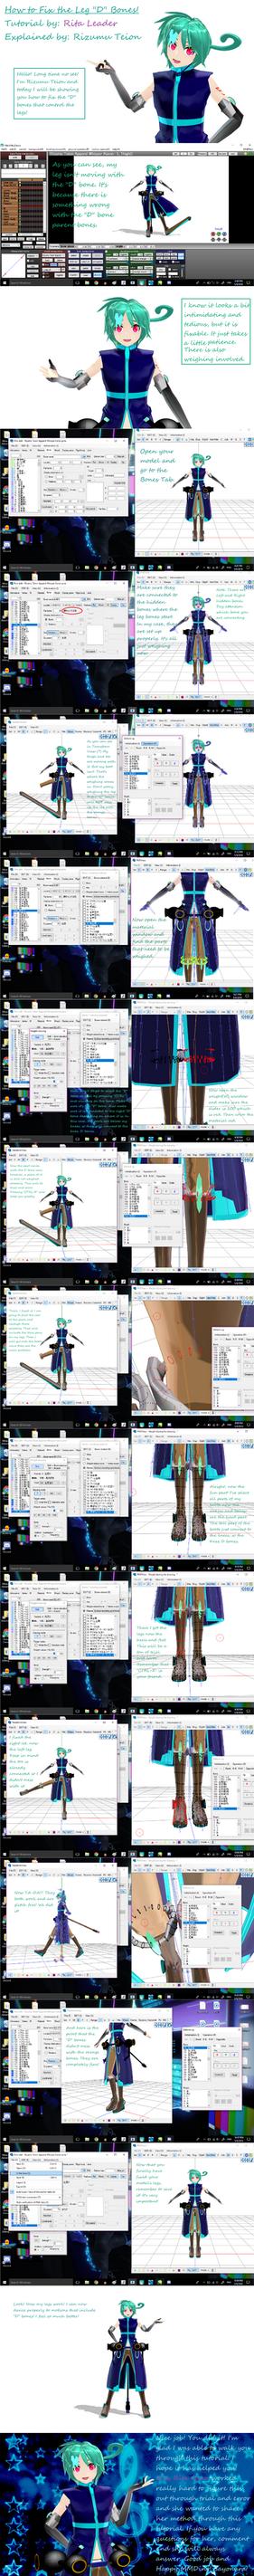 MMD PMD/PMX How to fix D Leg Bones by RitaLeader14